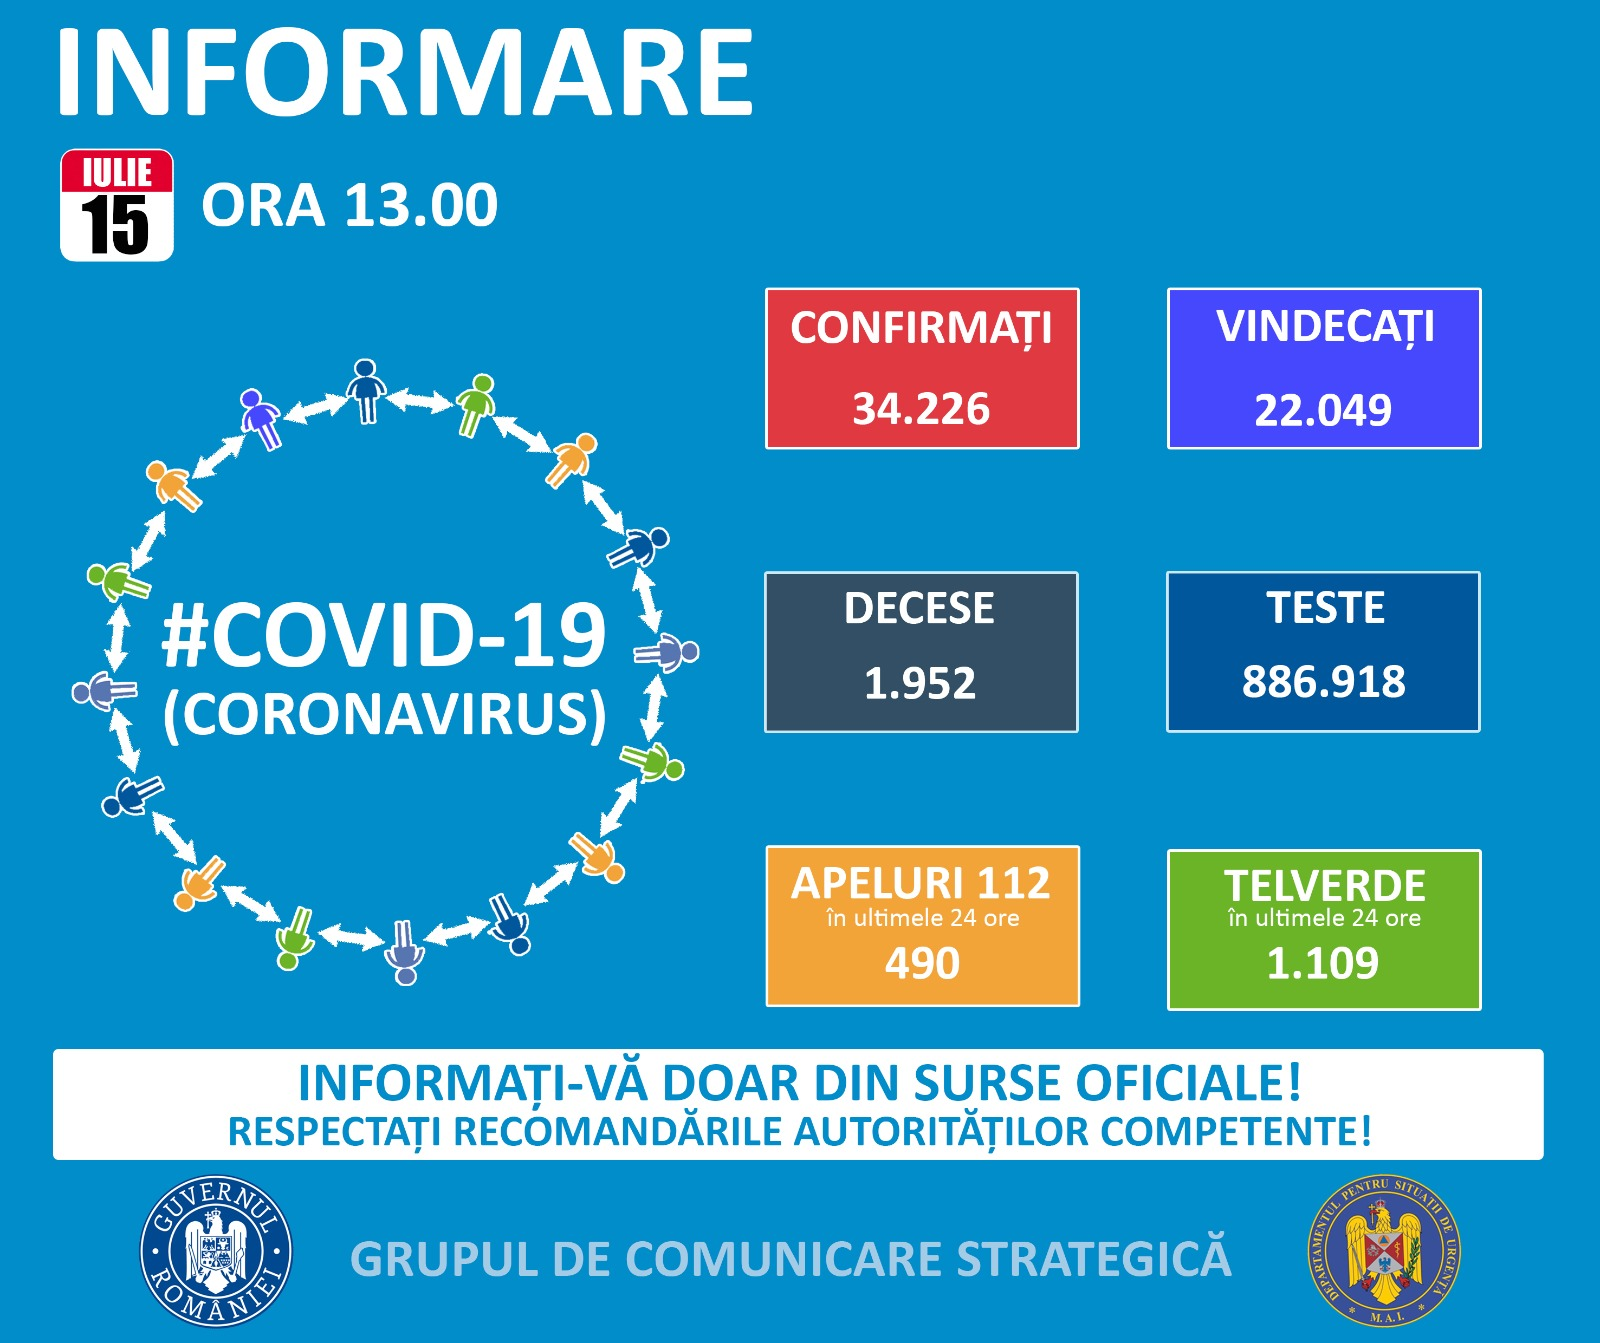 Coronavirus Romania situatie 15 iulie 2020